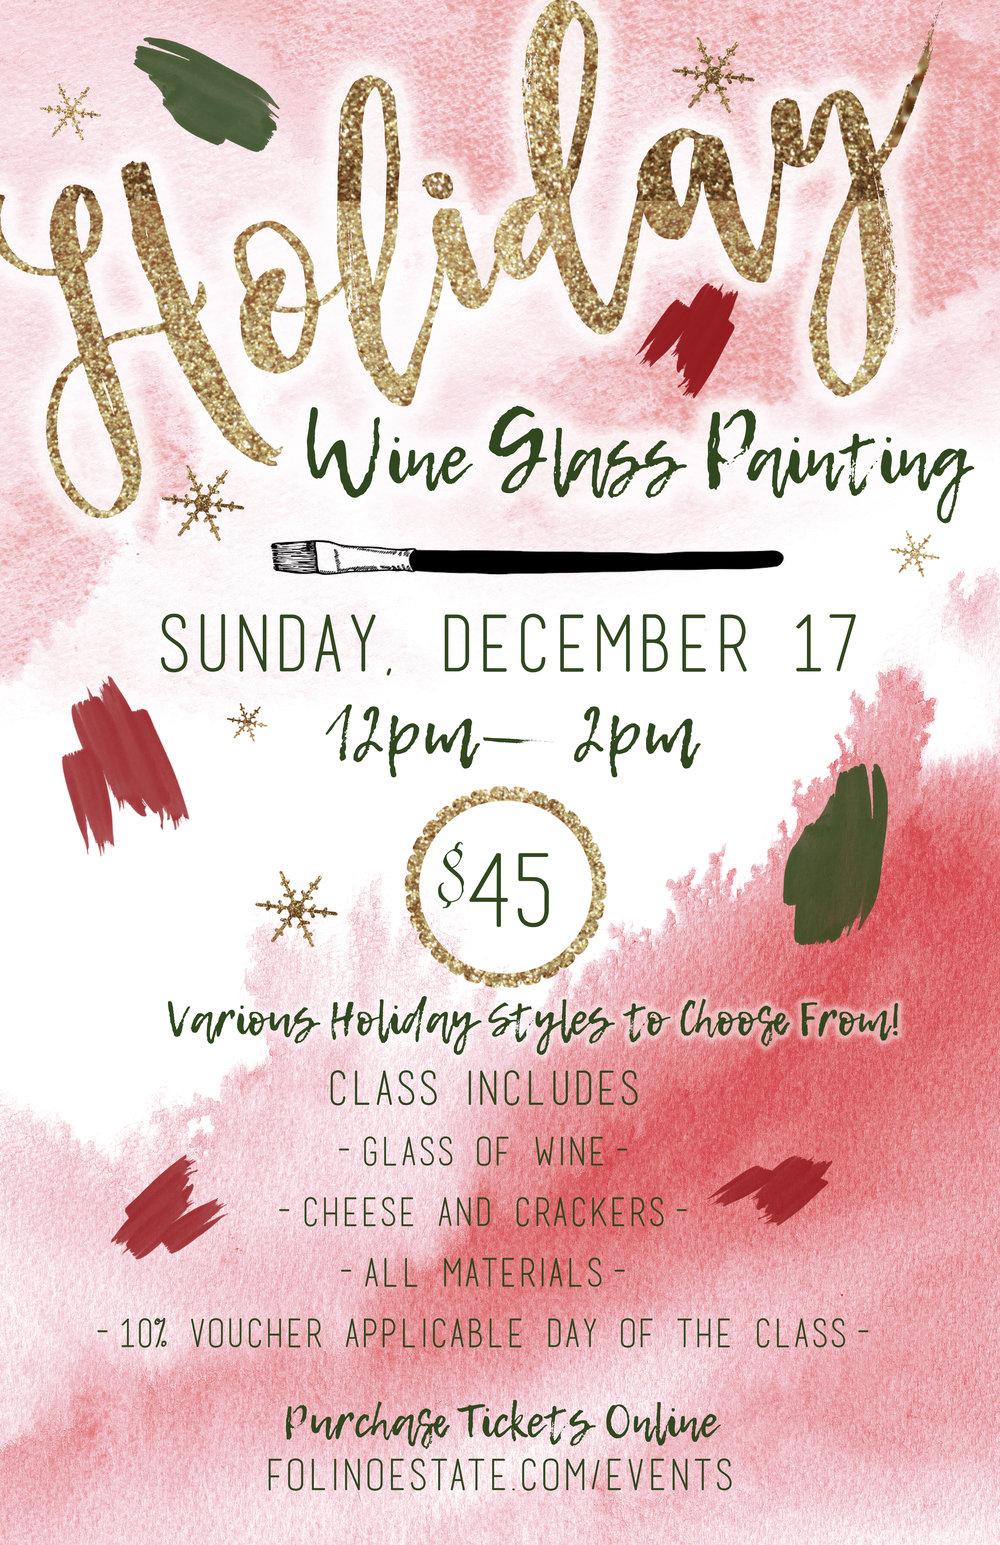 WineGlass Painting holiday-2017.jpg